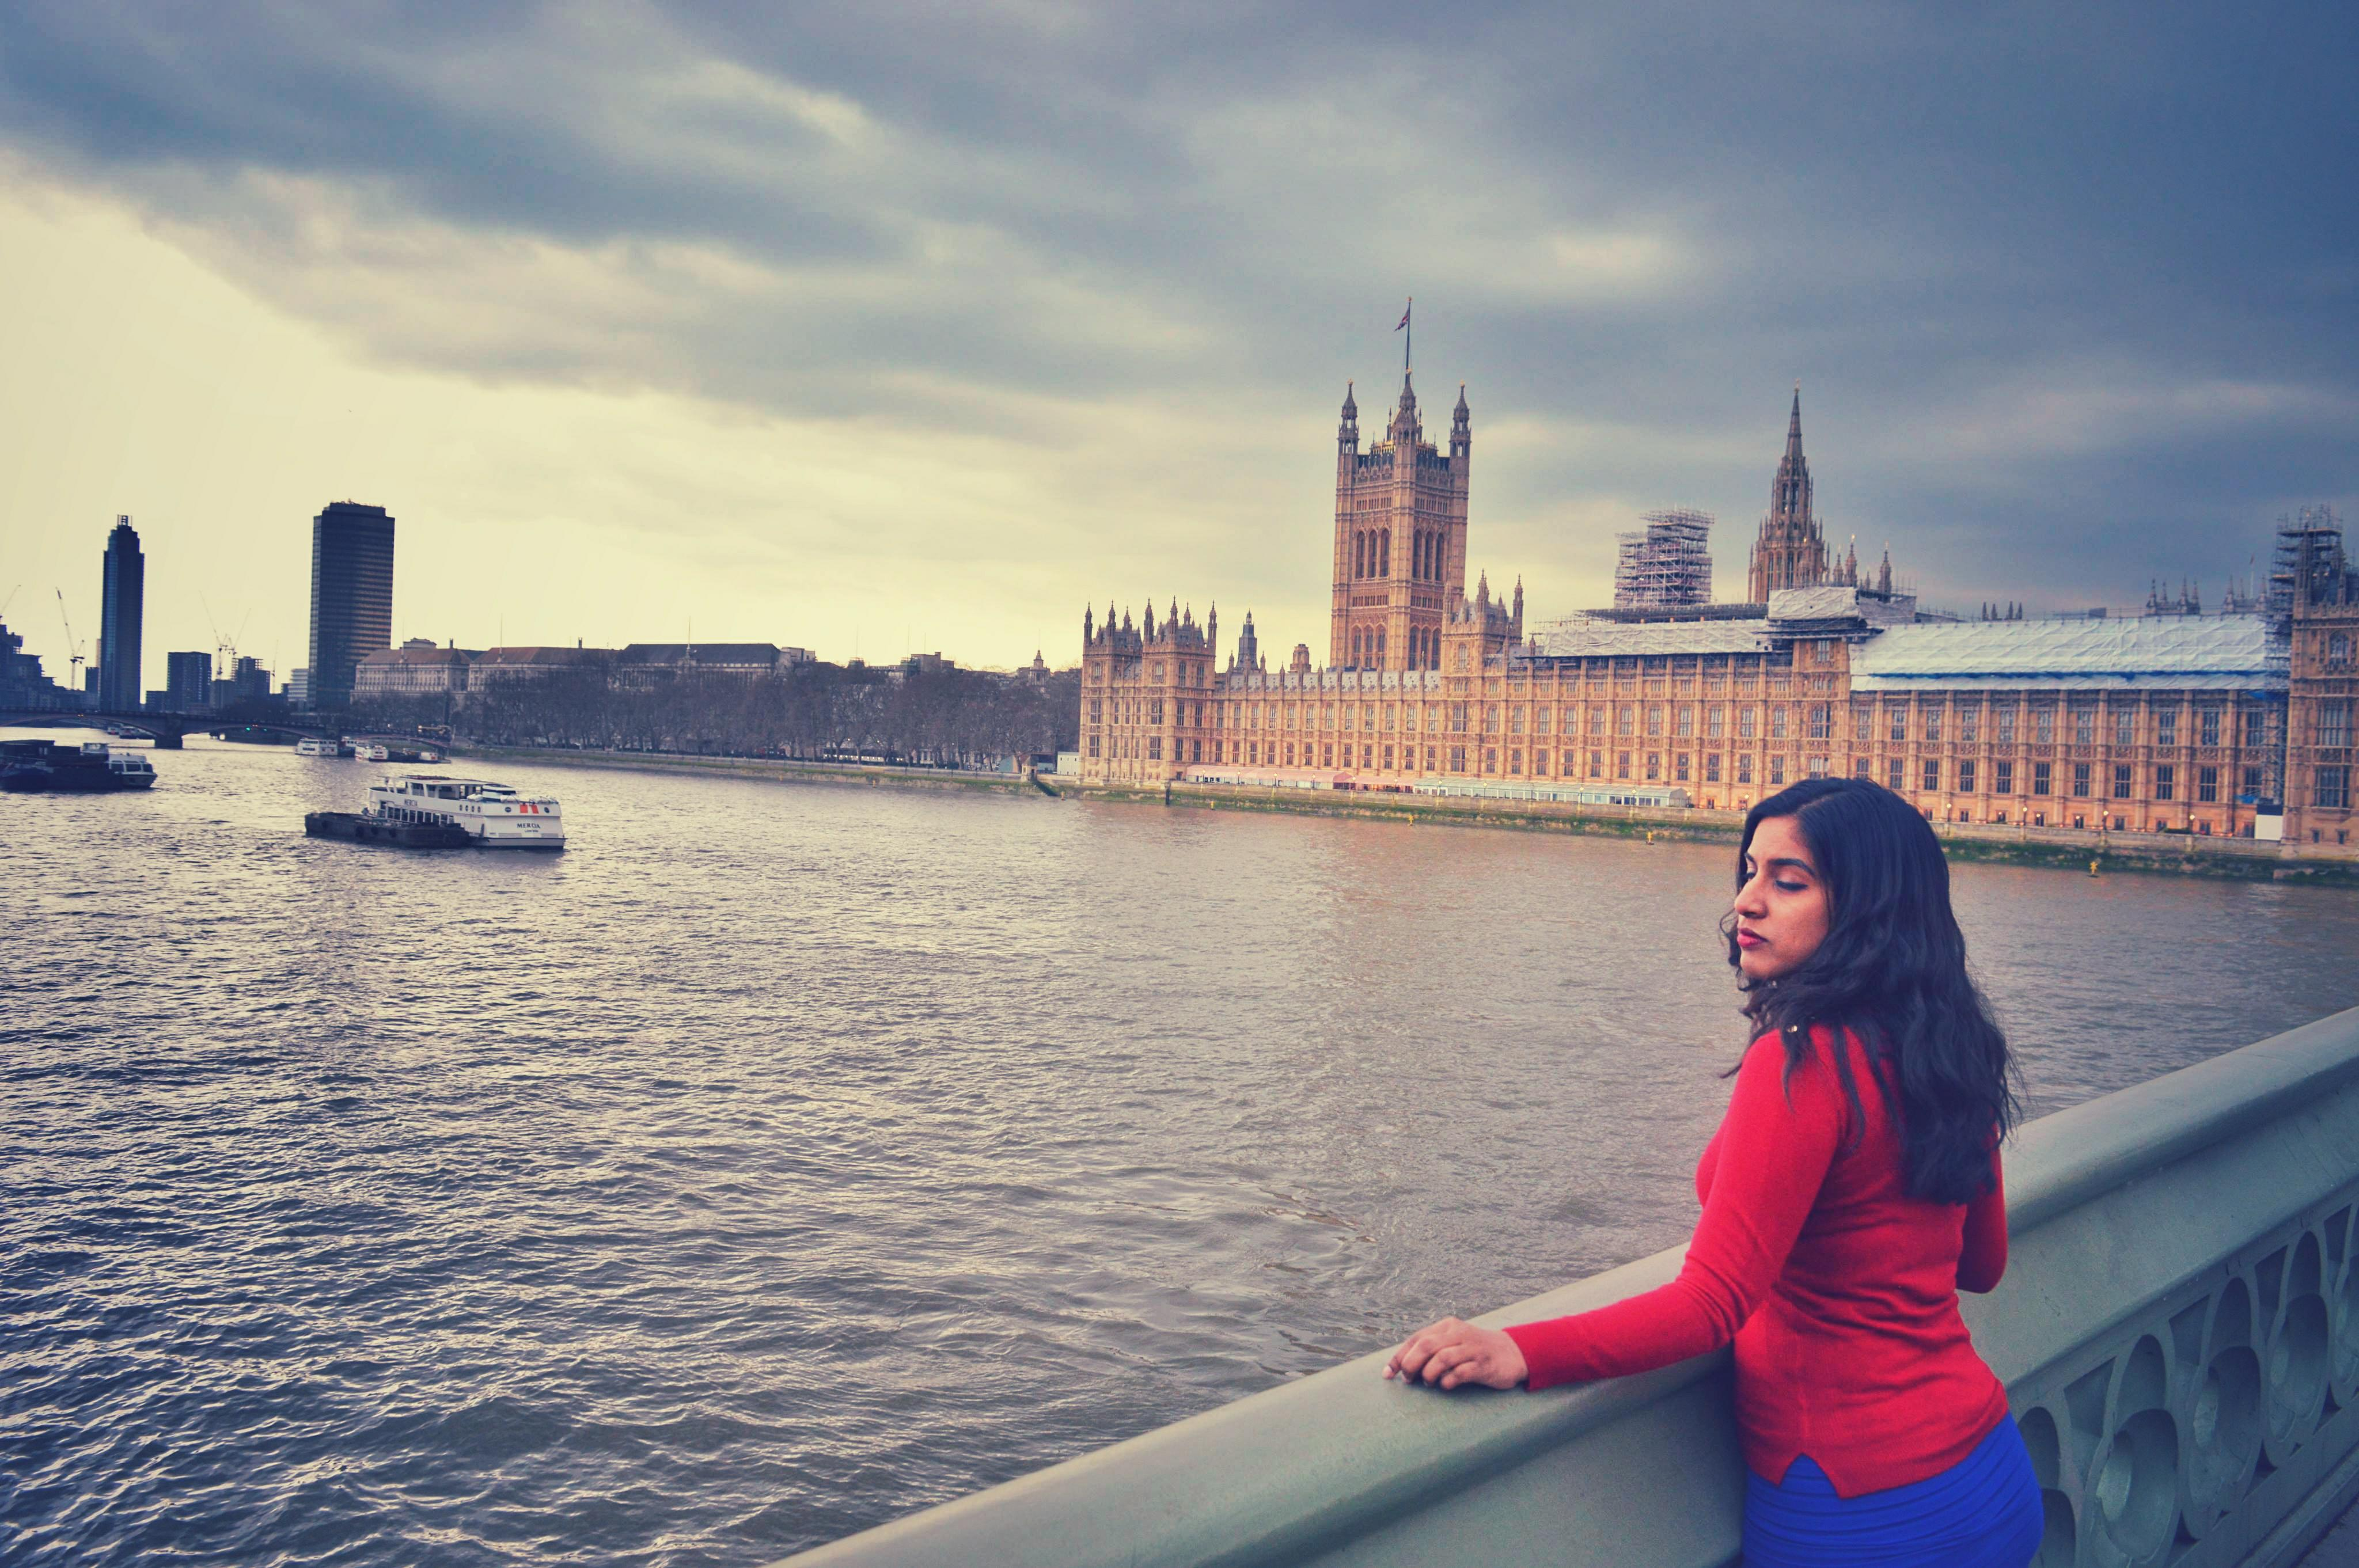 Indian girl in london